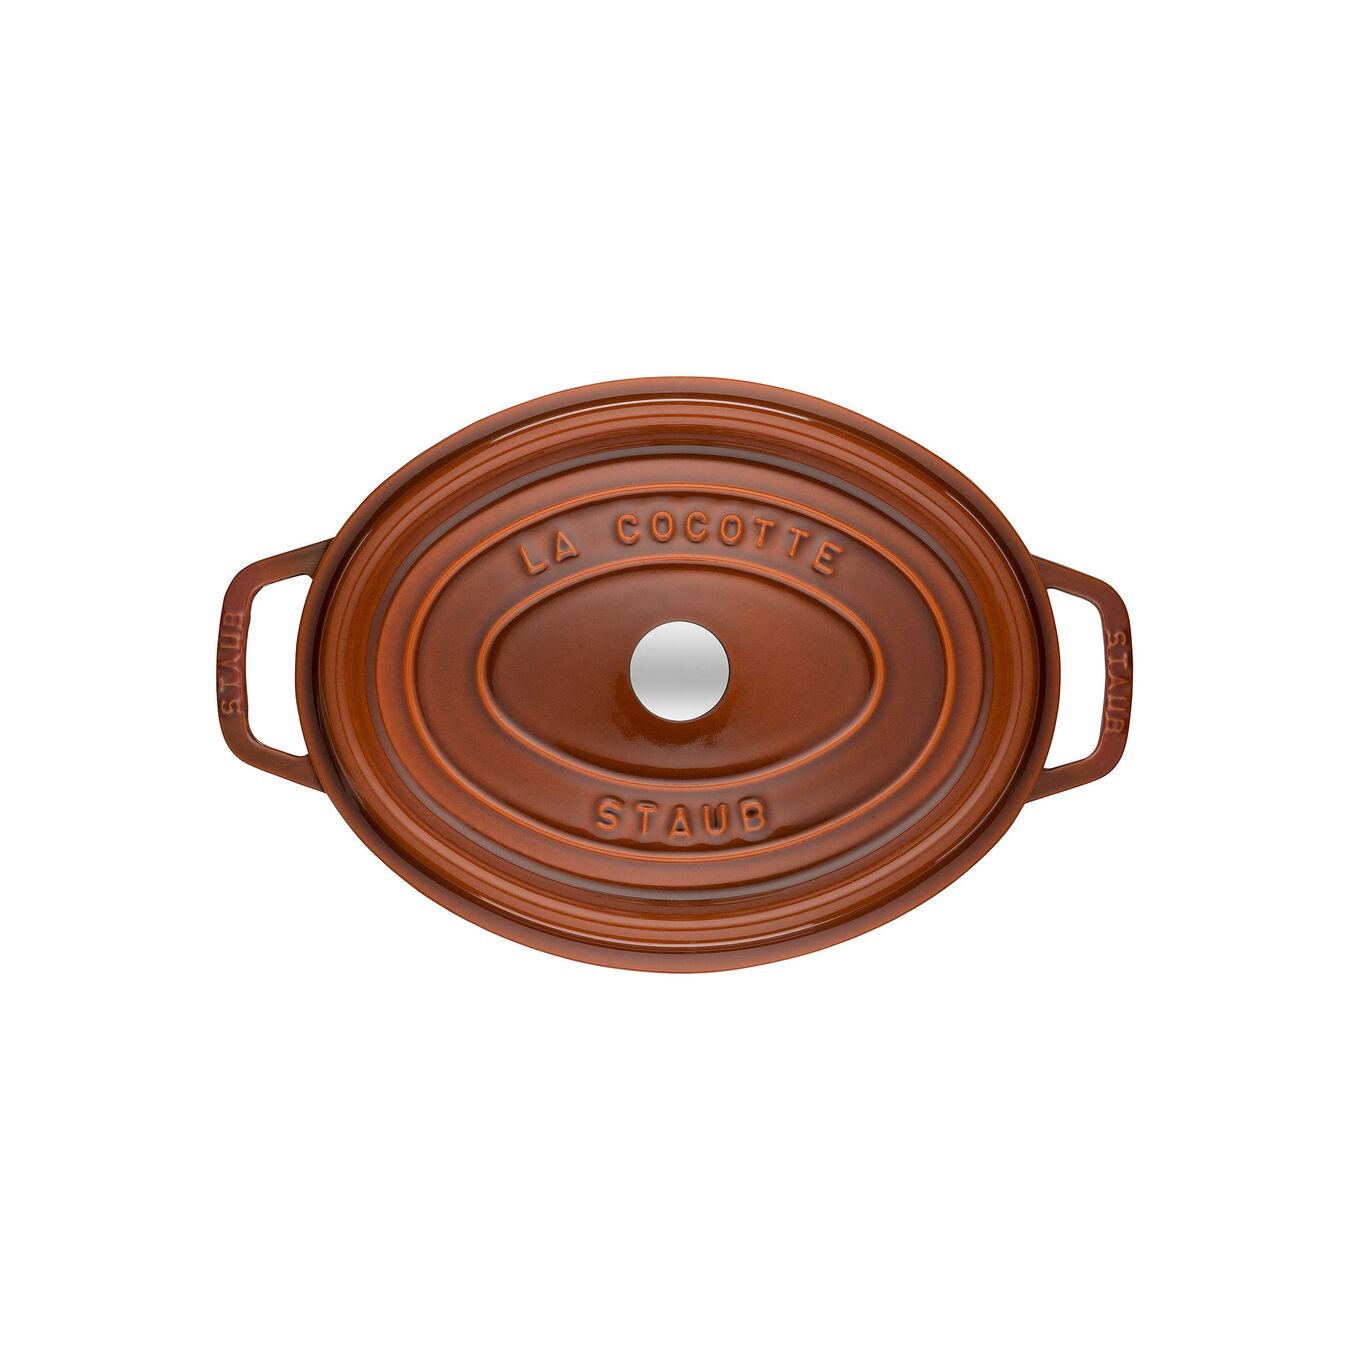 Cocotte 29 cm, Ovale, Cannelle, Fonte,,large 4